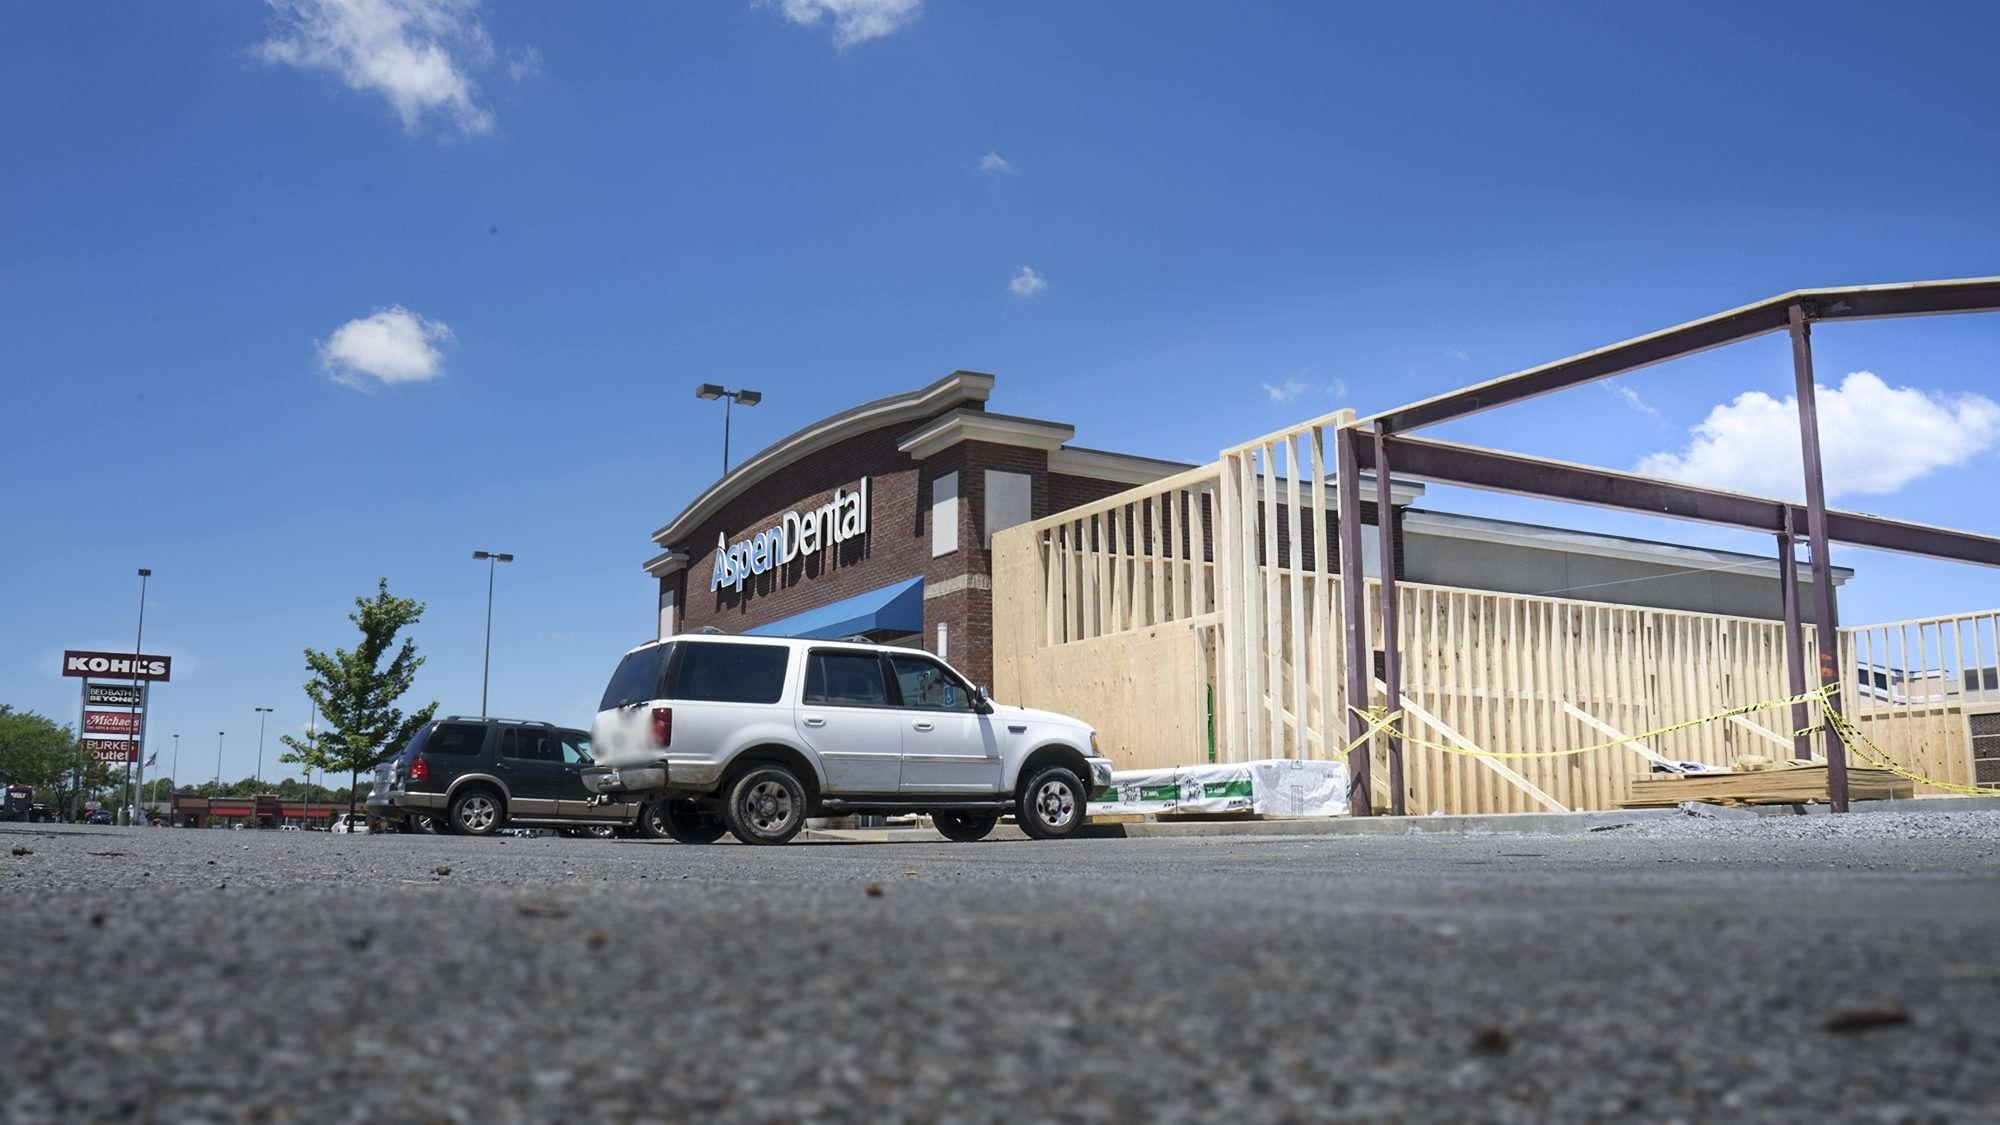 June 17, 2017 - Xfinity Comcast under construction adjacent to Aspen Dental, Hinkleville Rd, Kentucky Oaks Mall in Paducah, KY/photonews247.com